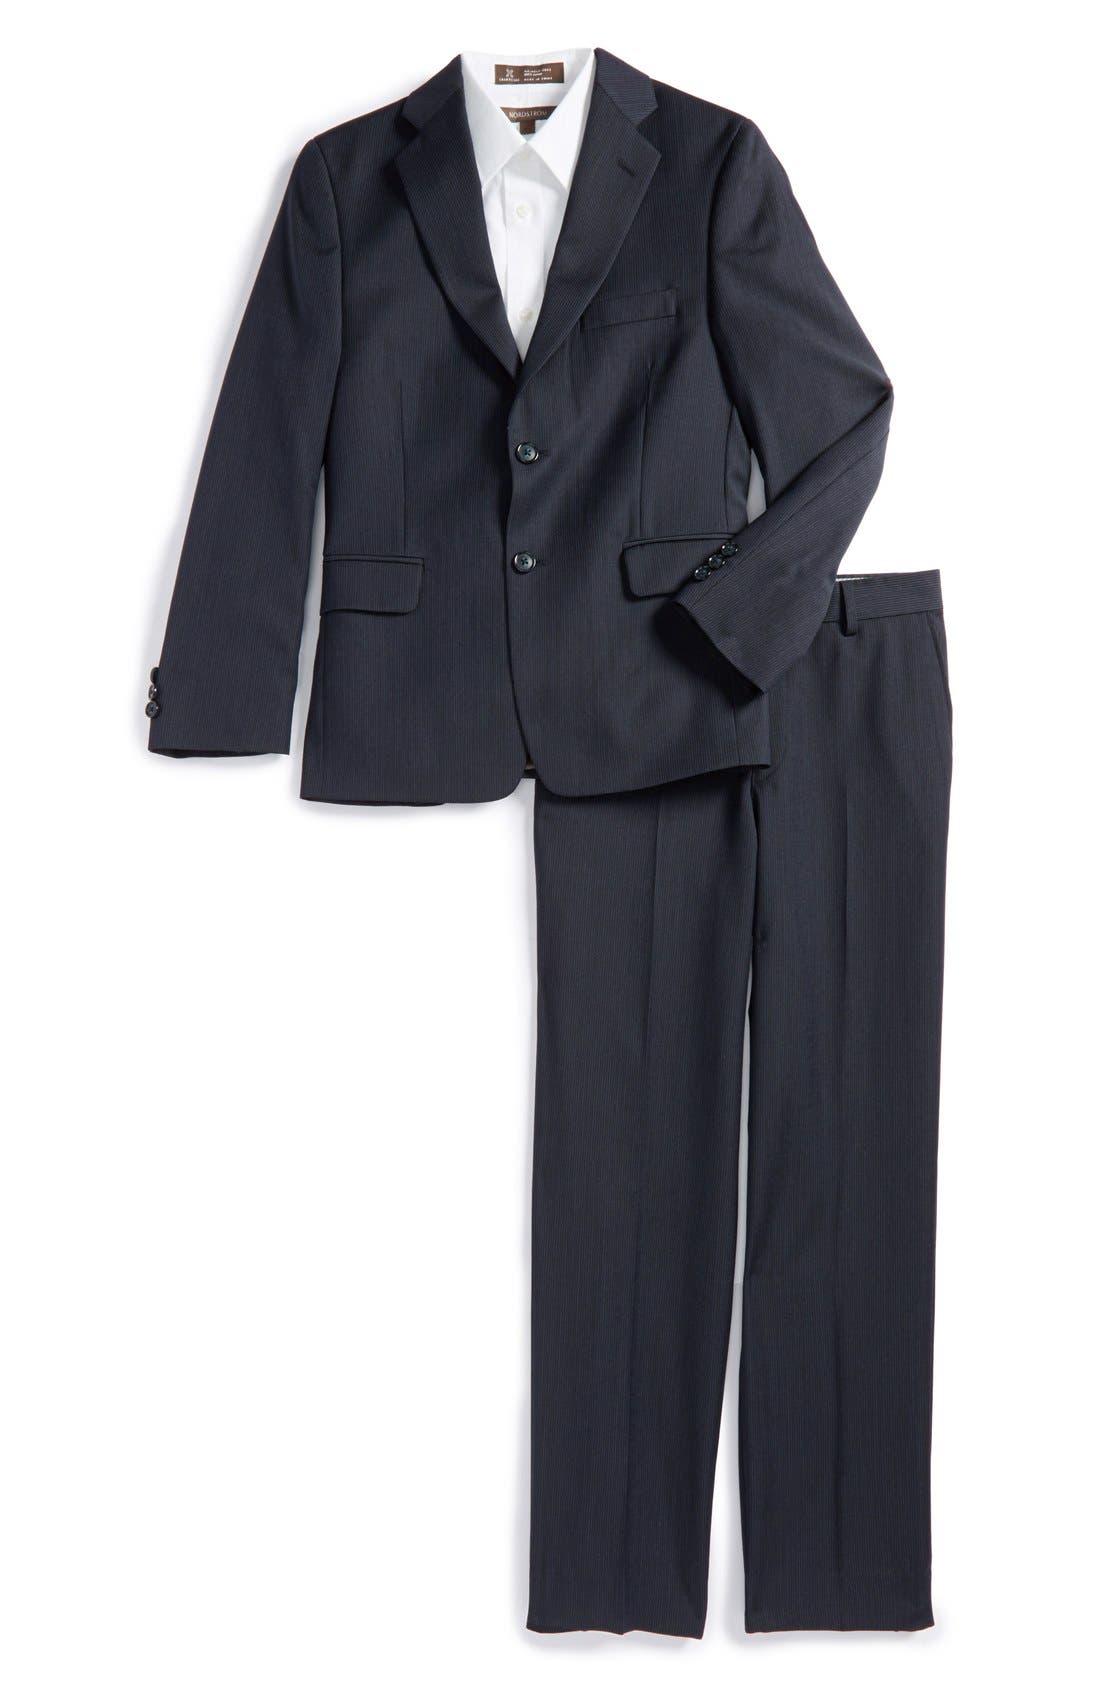 Main Image - Nordstrom 'Nathaniel' Stripe Suit (Big Boys)